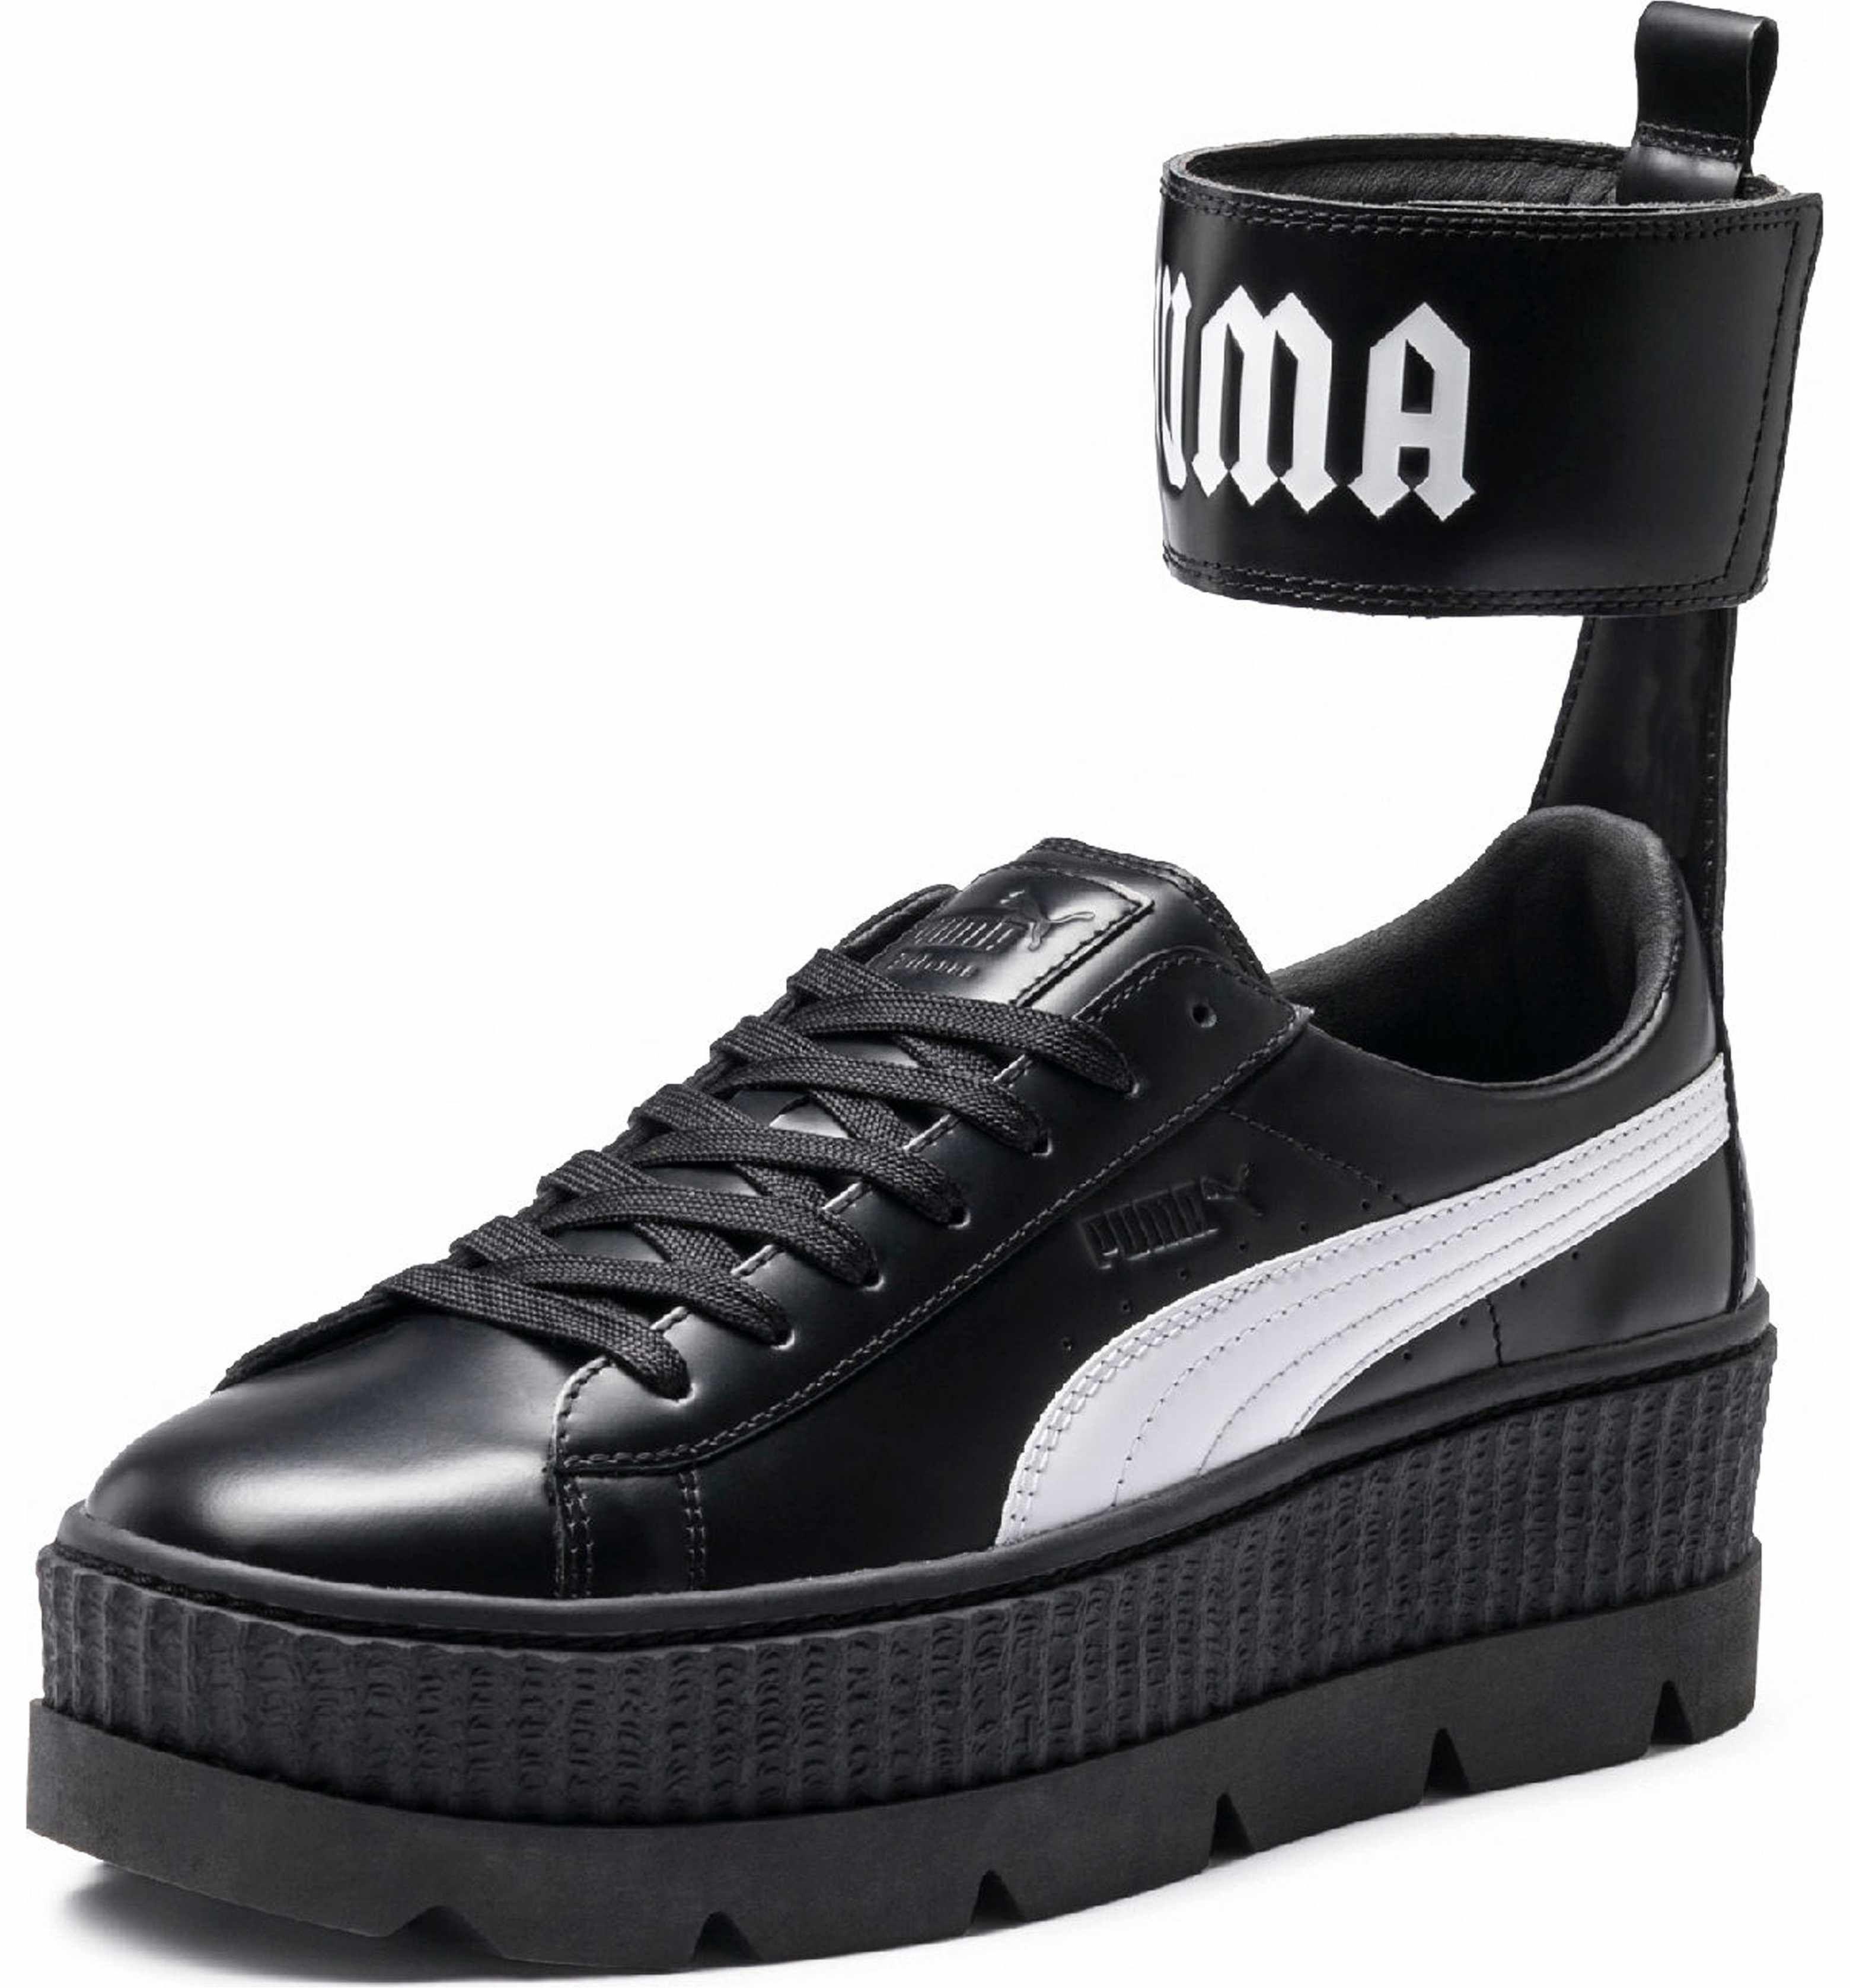 fenty puma scarpe